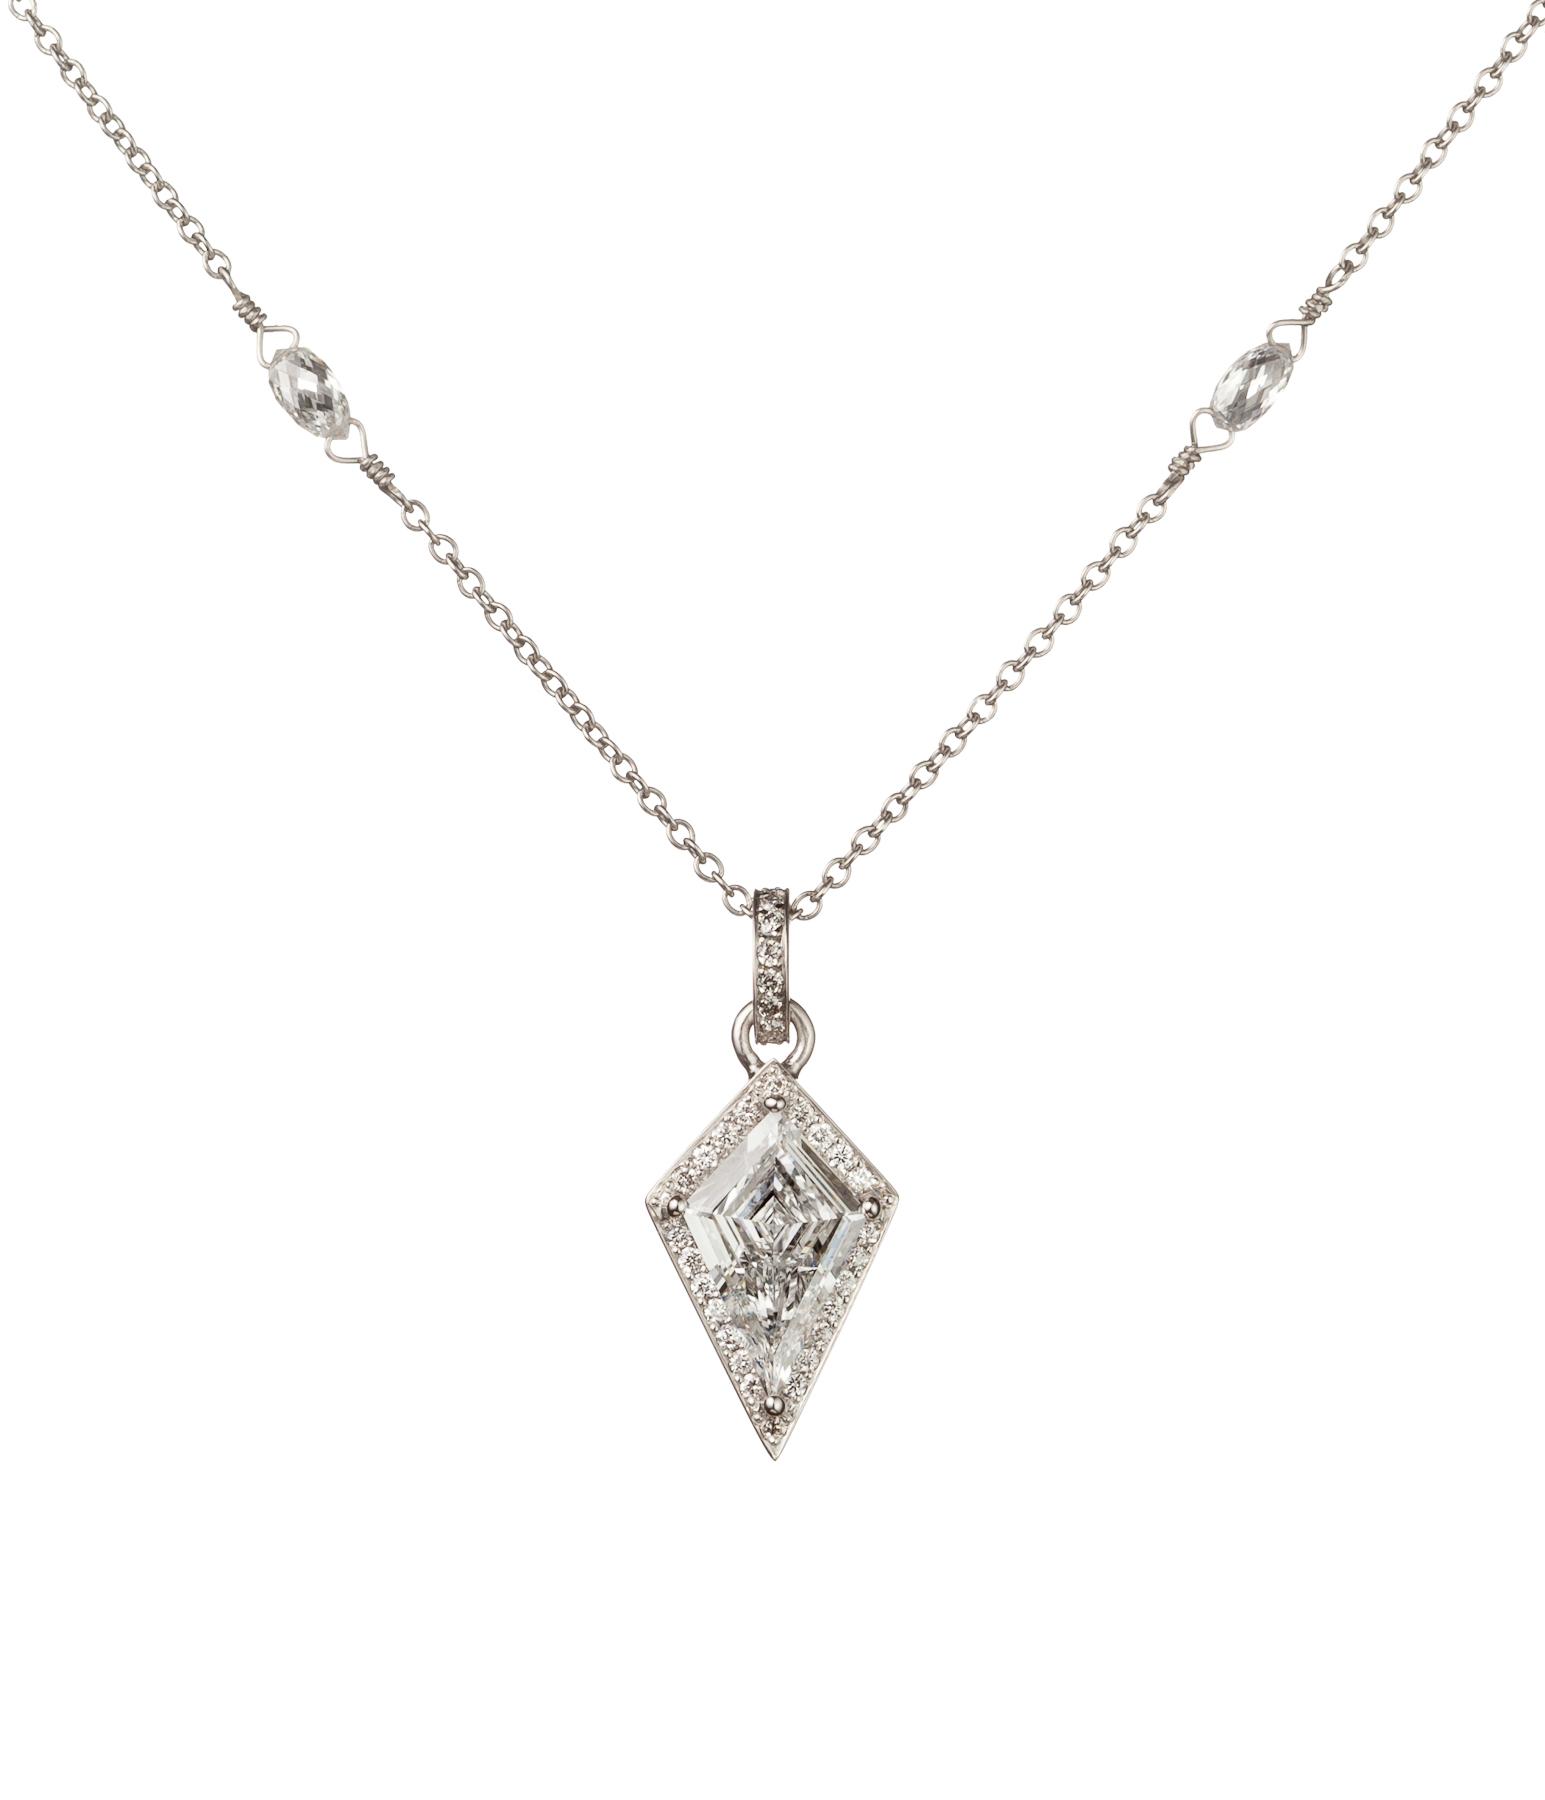 Kite Diamond Pendant with Diamond Halo, in Platinum with Diamond Bezels.